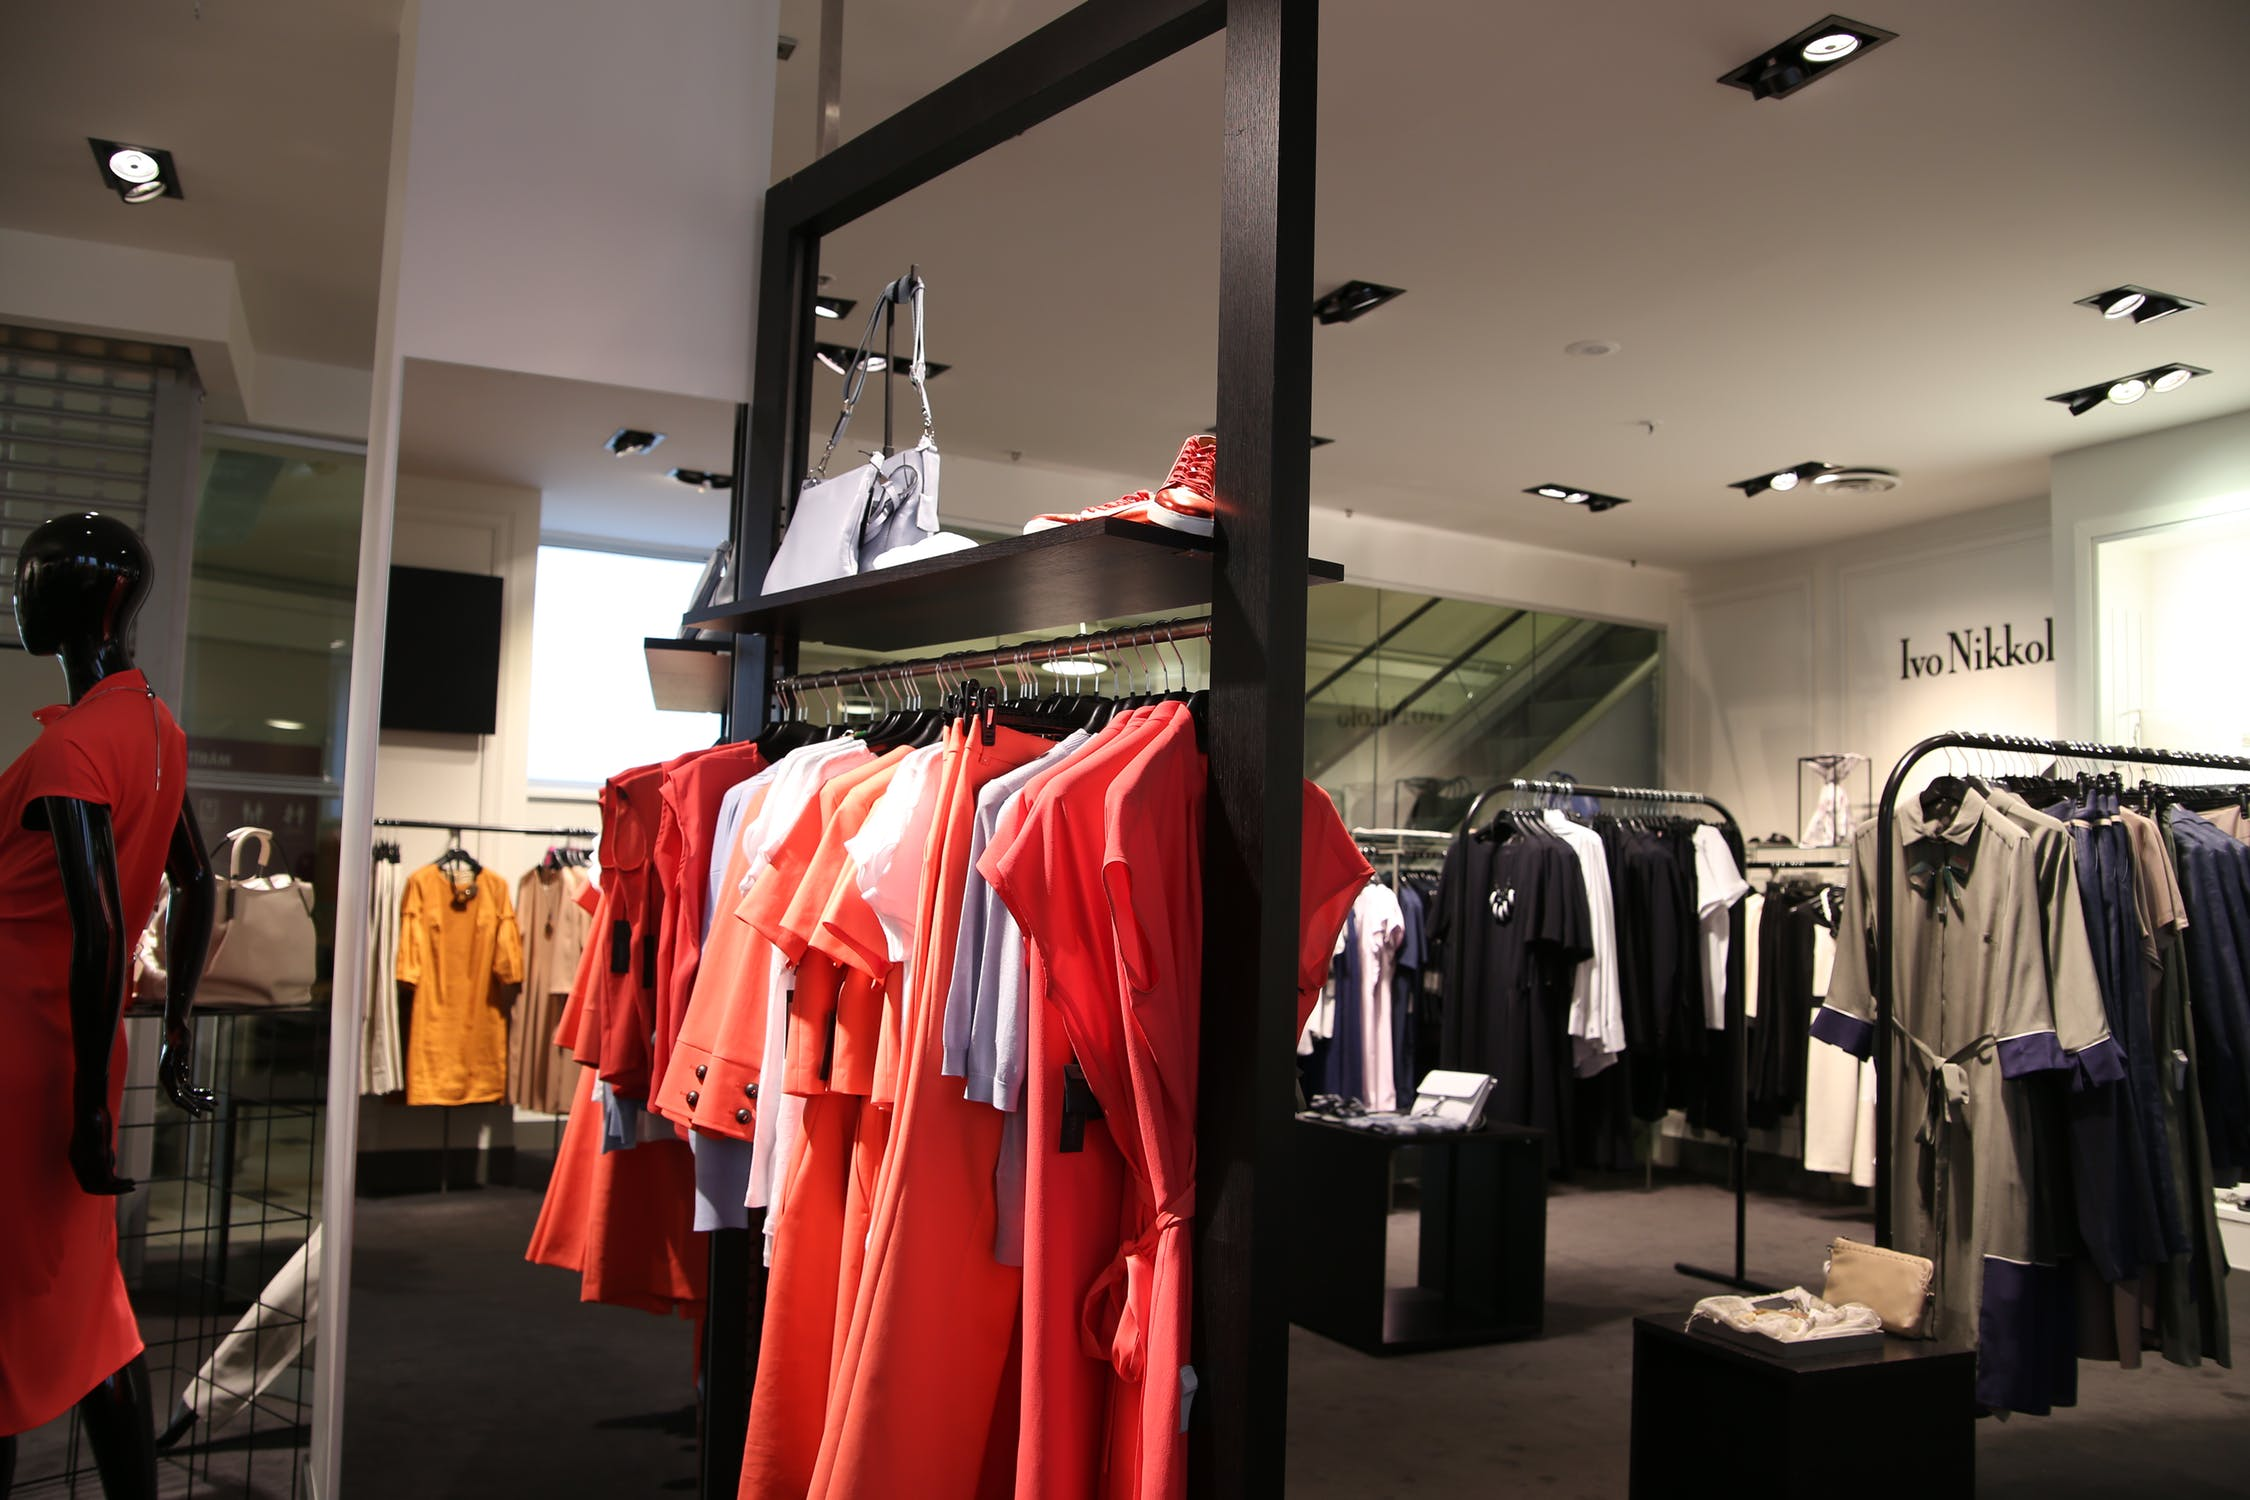 loja de roupas sem gênero